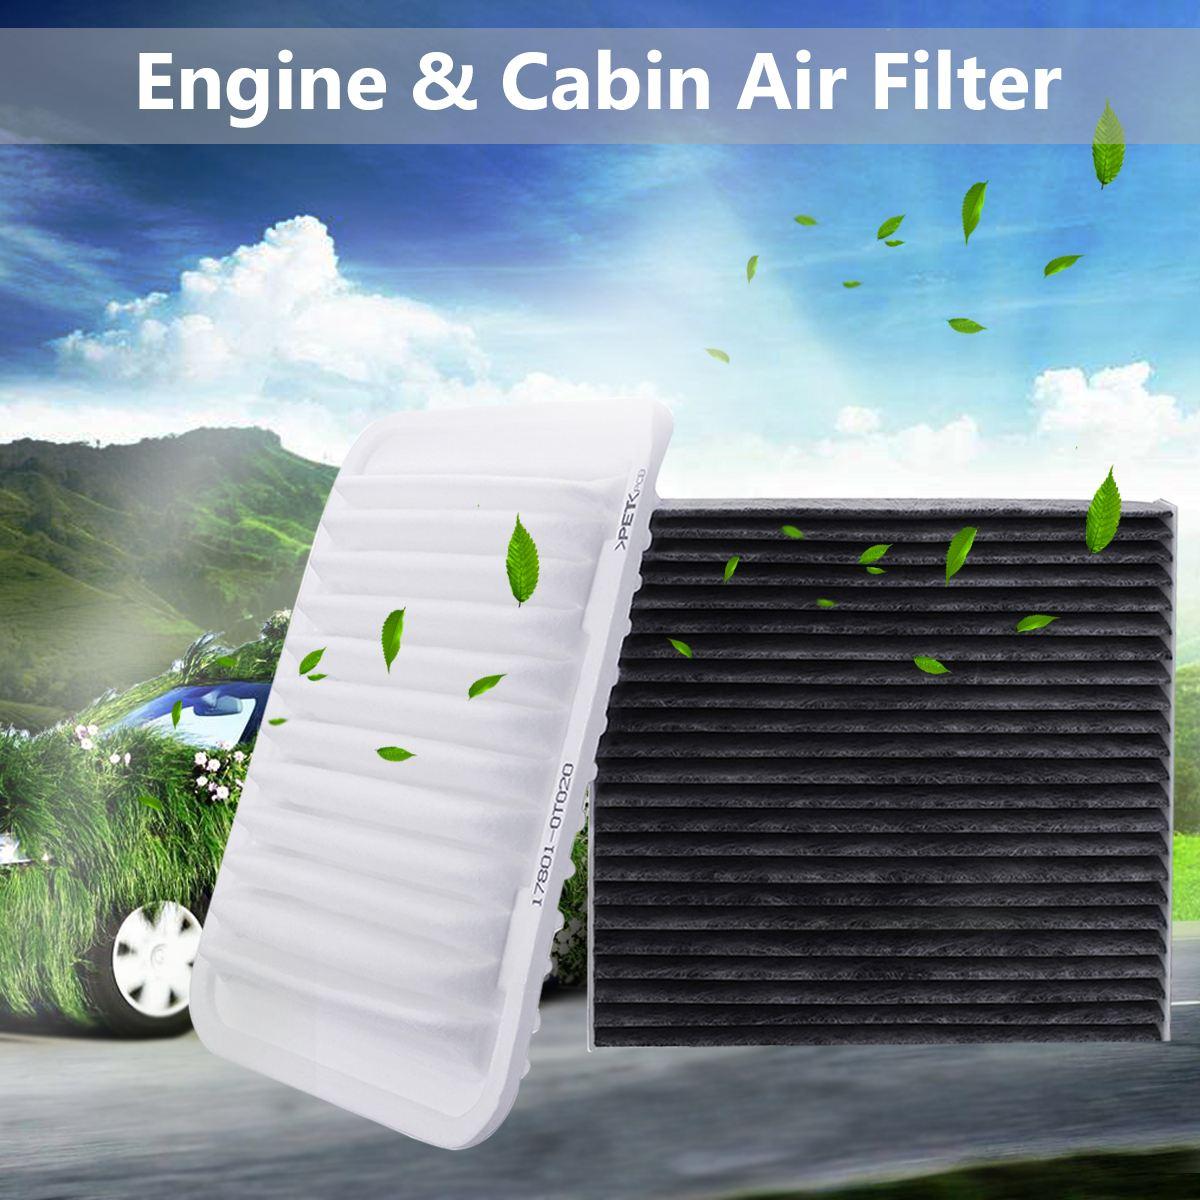 2Pcs Engine Air Filter&Cabin Air Filter For Toyota Corolla Yaris Matrix 2008-2018 17801-21050 87139-YZZ0 87139-50100 pentius ultraflow cabin air filter page 5